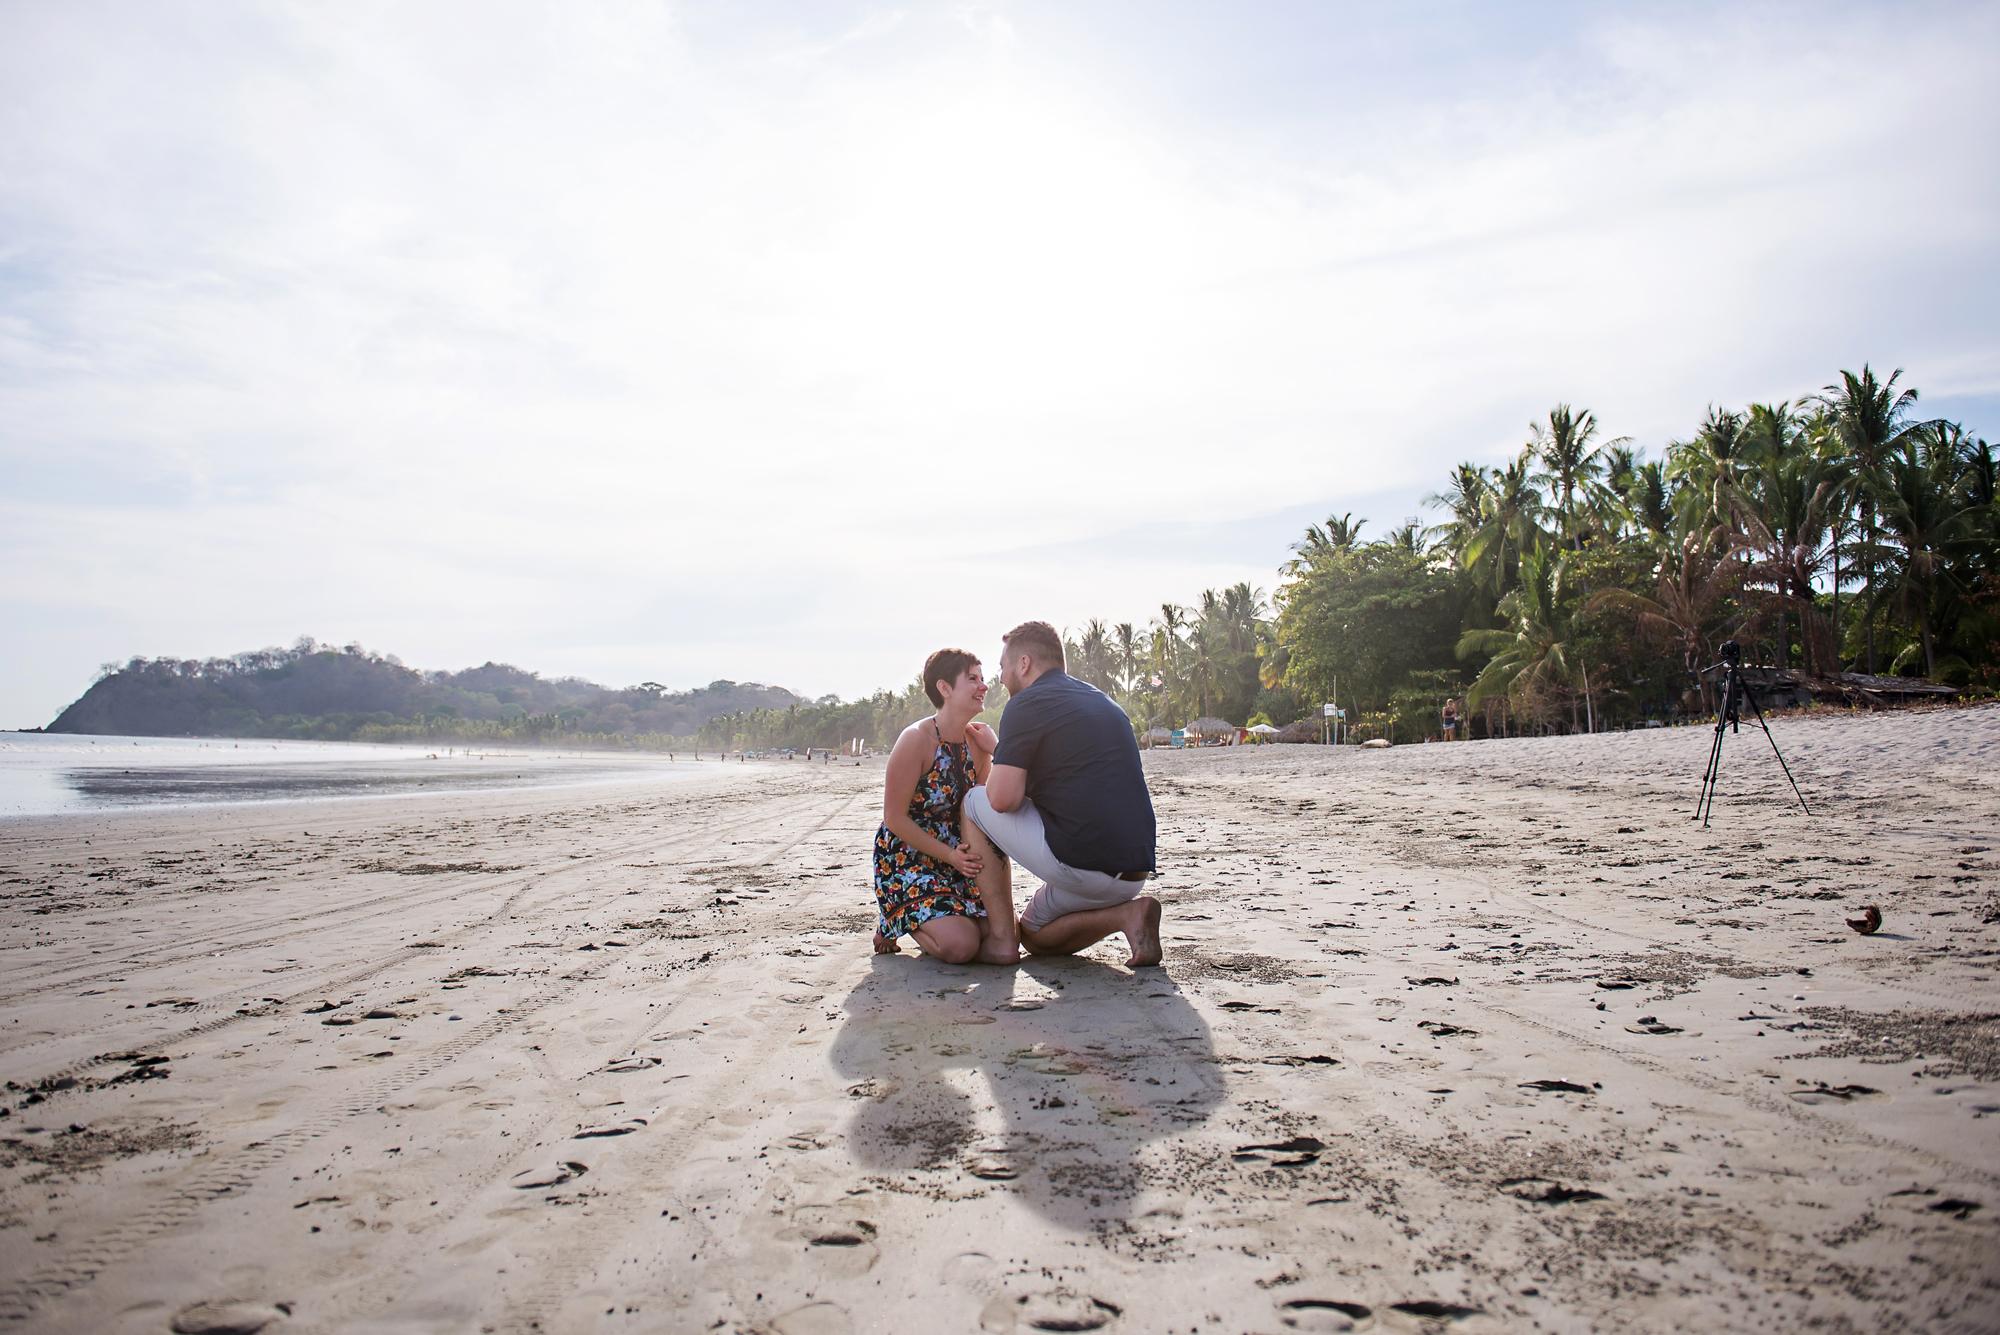 Daniel_Kelsie_Engagement_Costa_Rica_Engagement_5.jpg